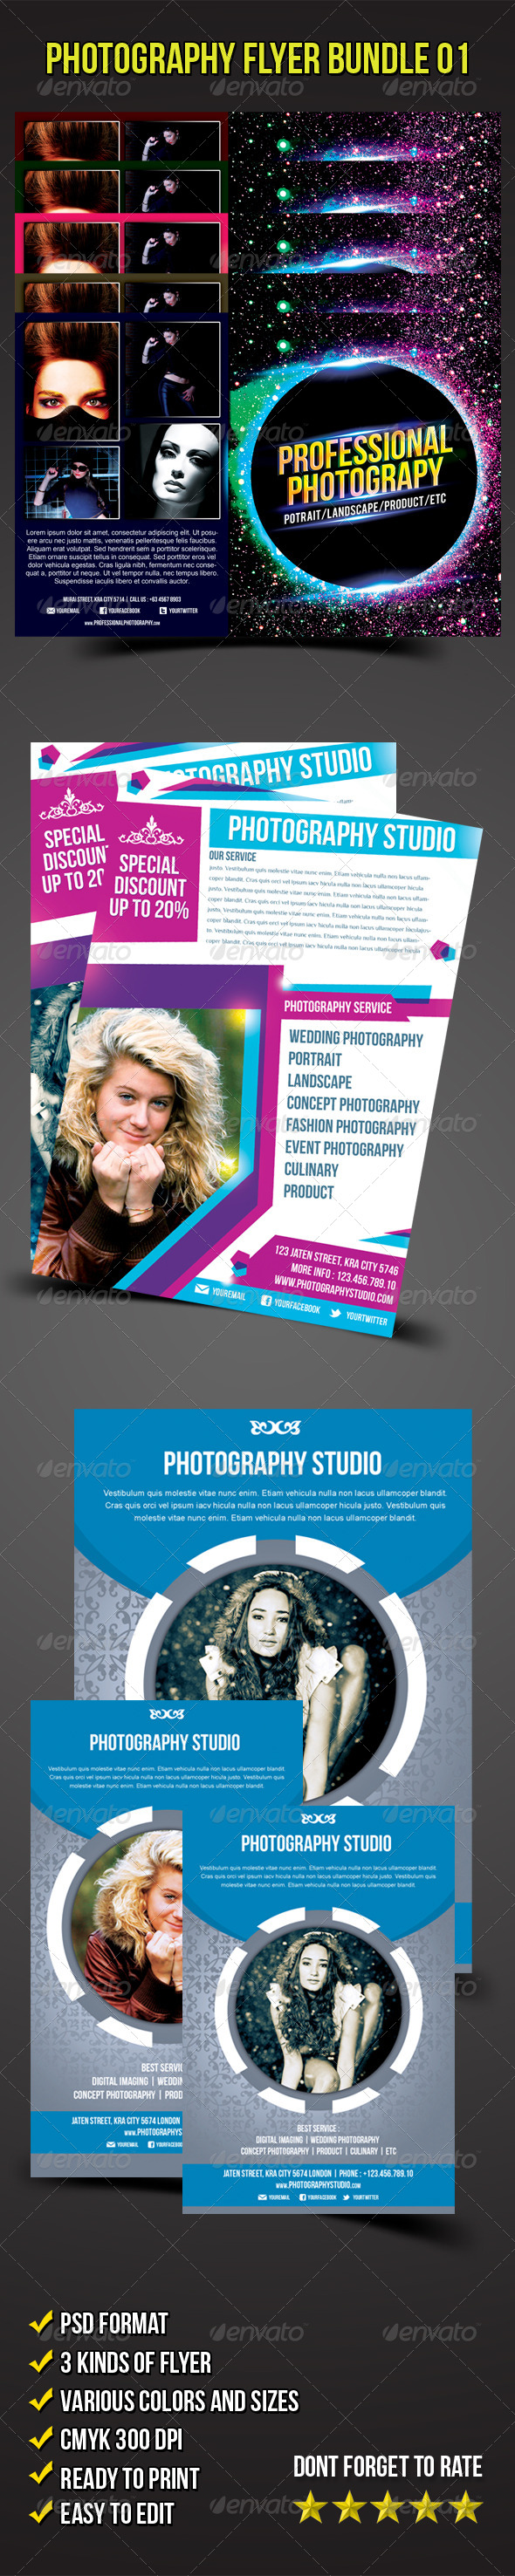 Flyer Bundle 01 (Photography Flyer) - Corporate Flyers